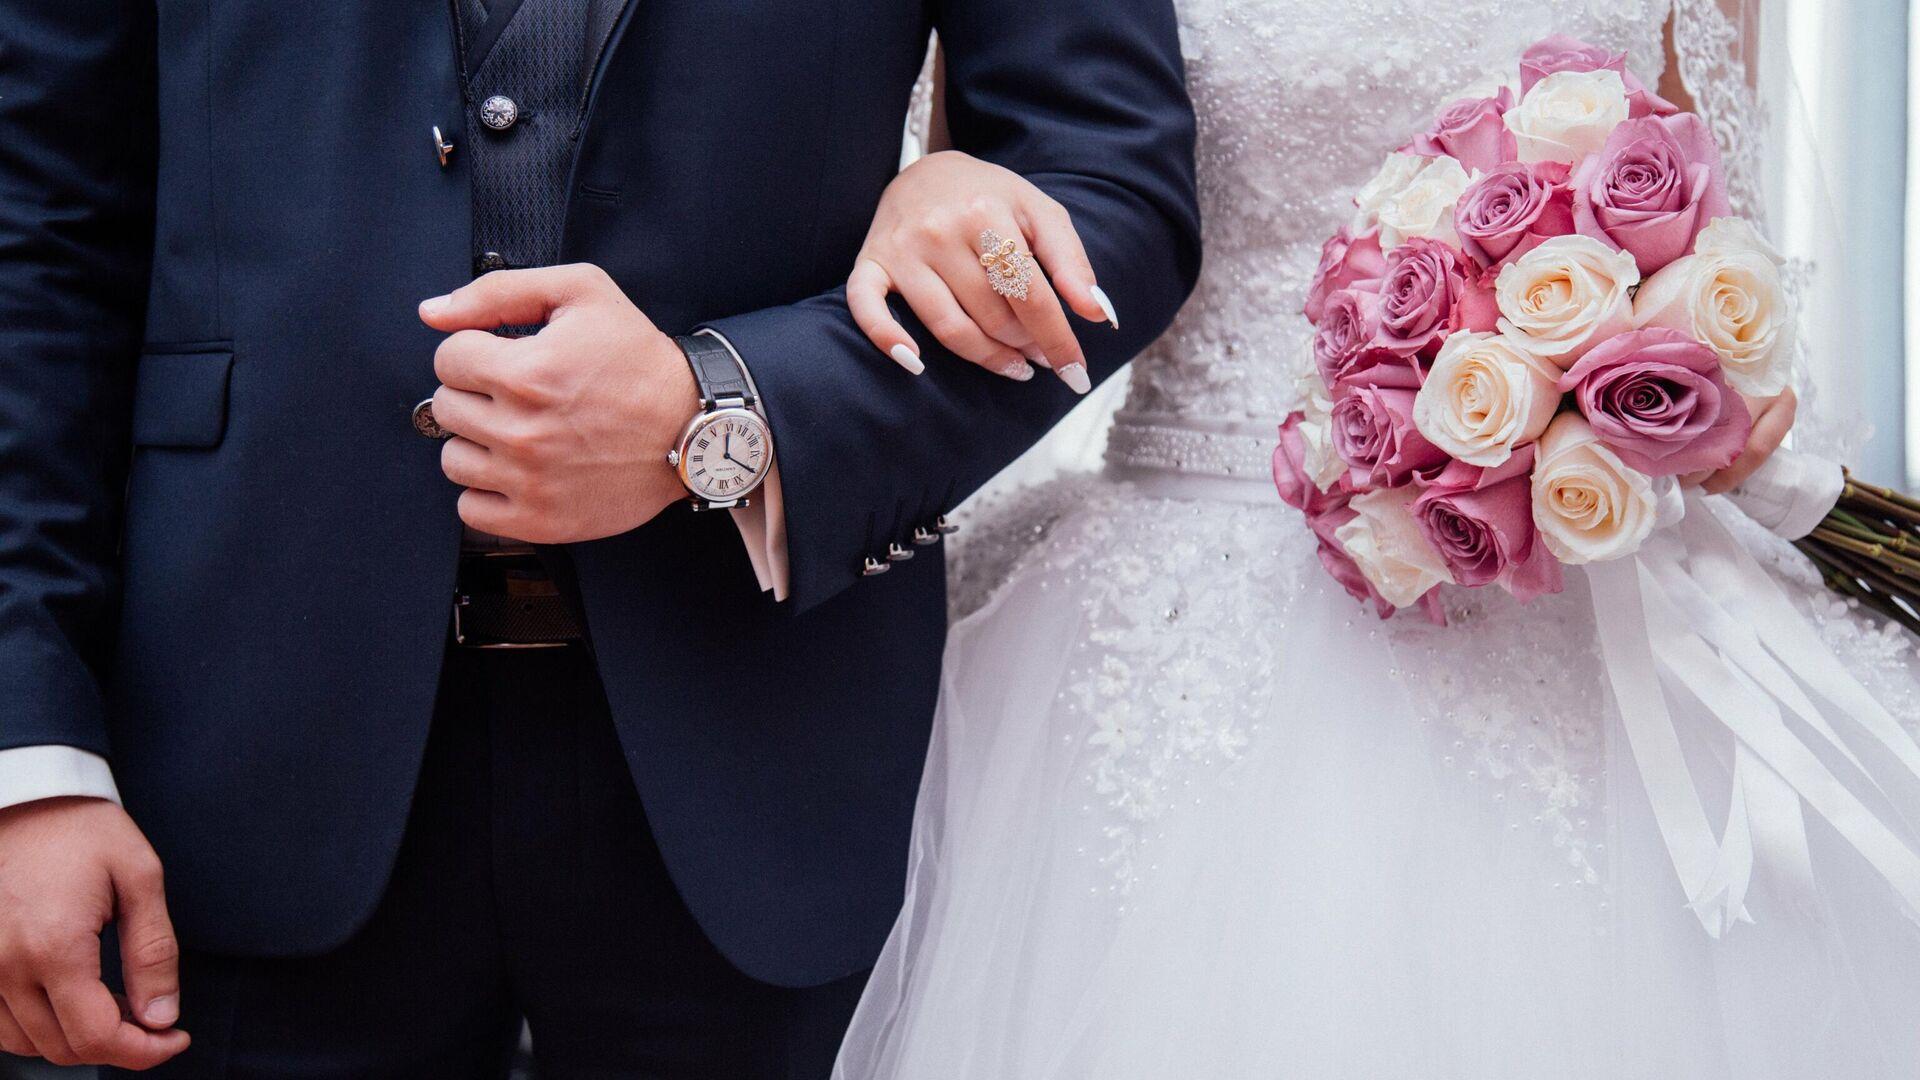 Disminuyen matrimonios en México  - Sputnik Mundo, 1920, 30.09.2021